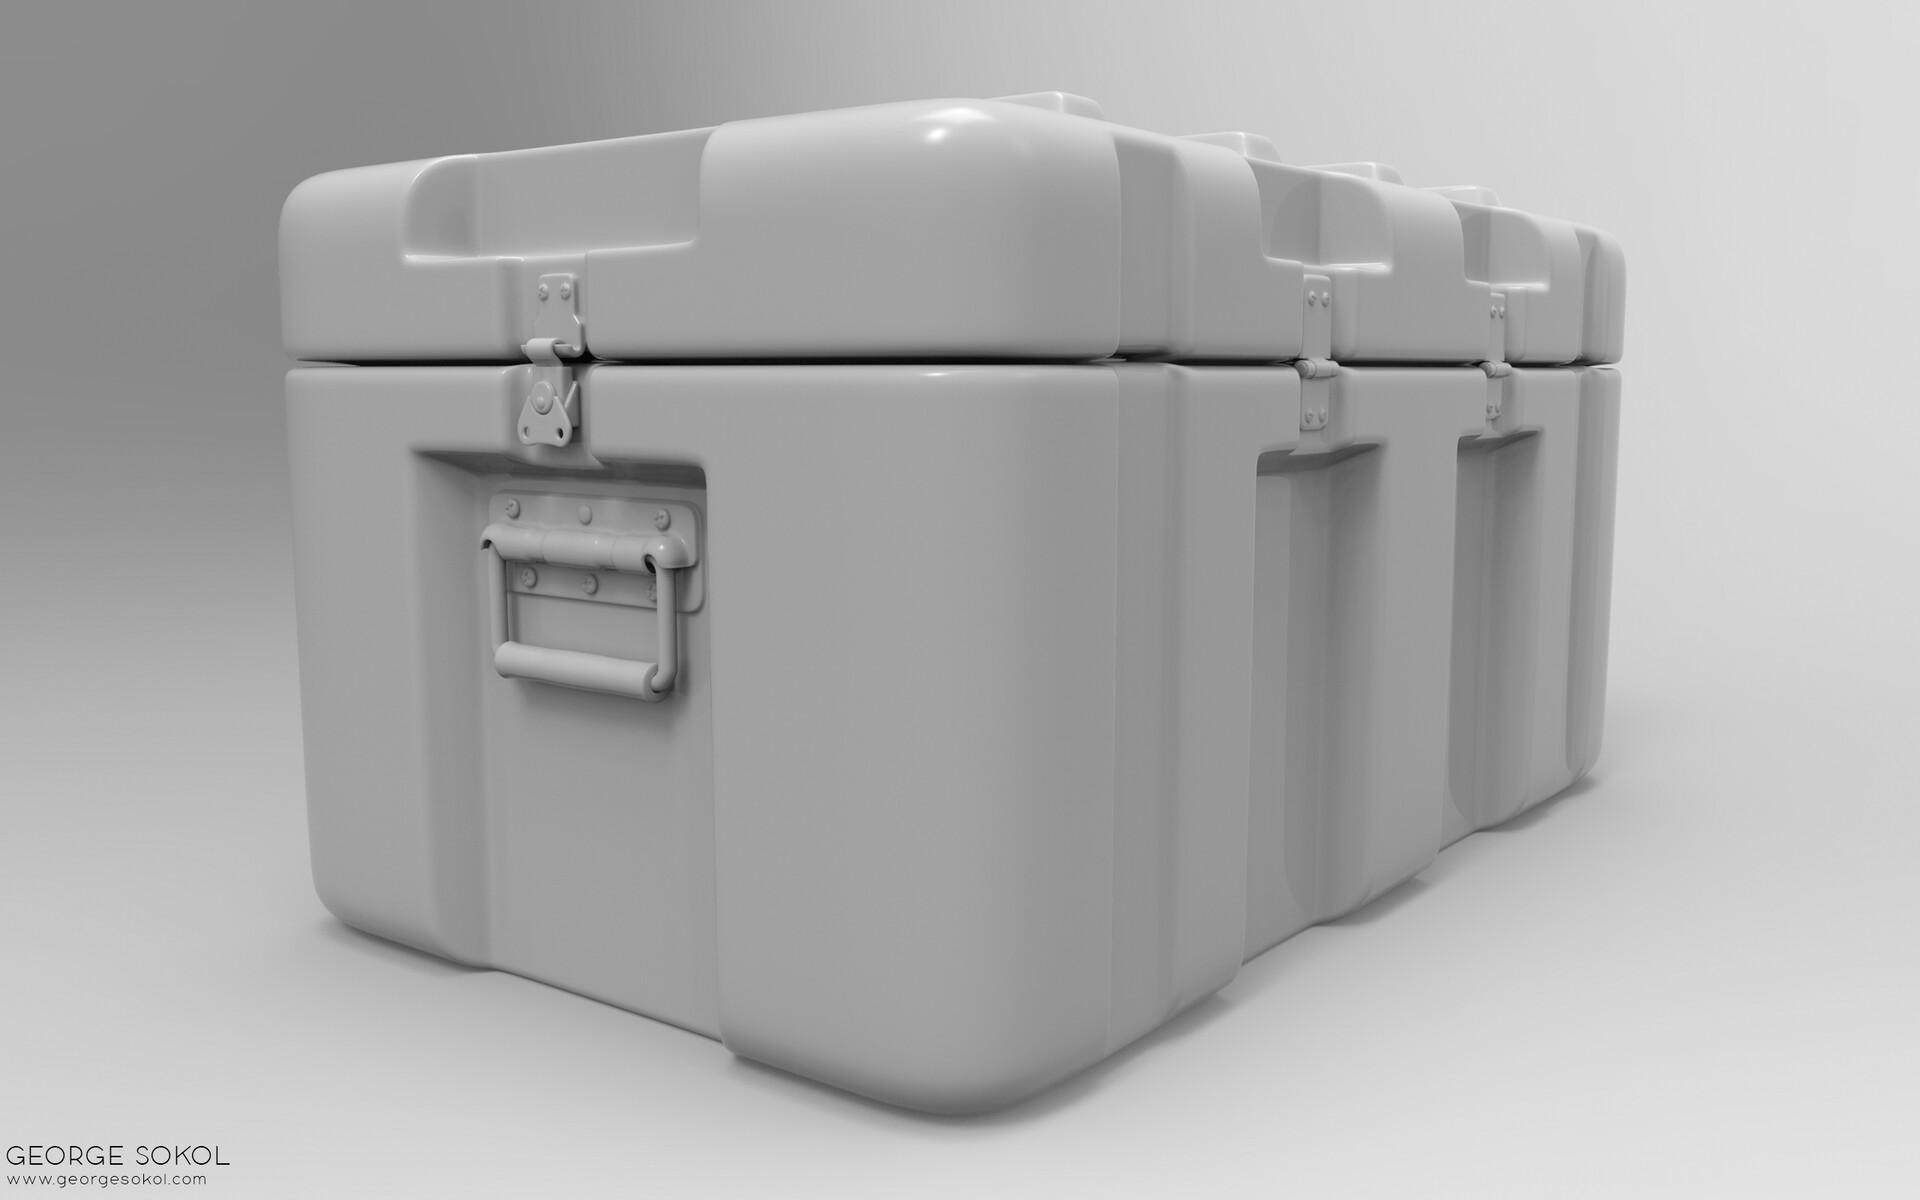 George sokol gs crate hp 2